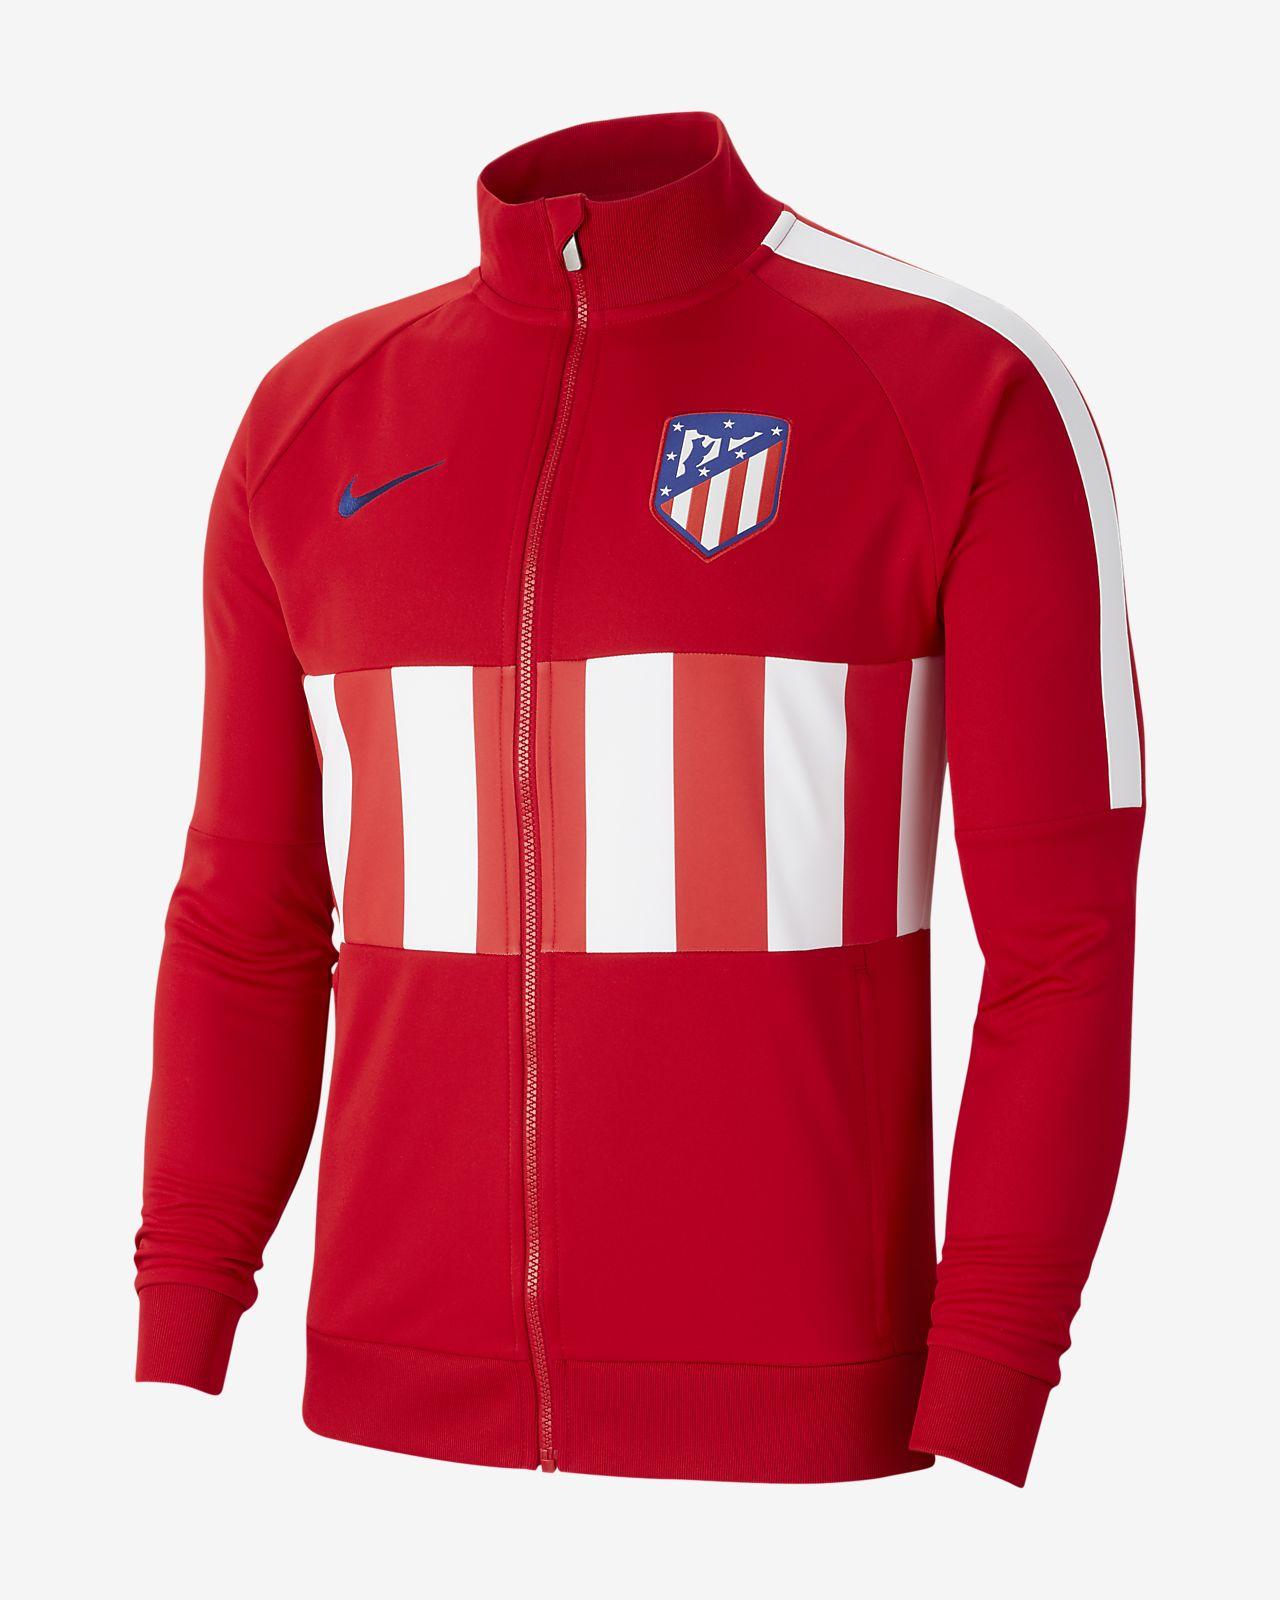 Atlético de Madrid Men's Jacket